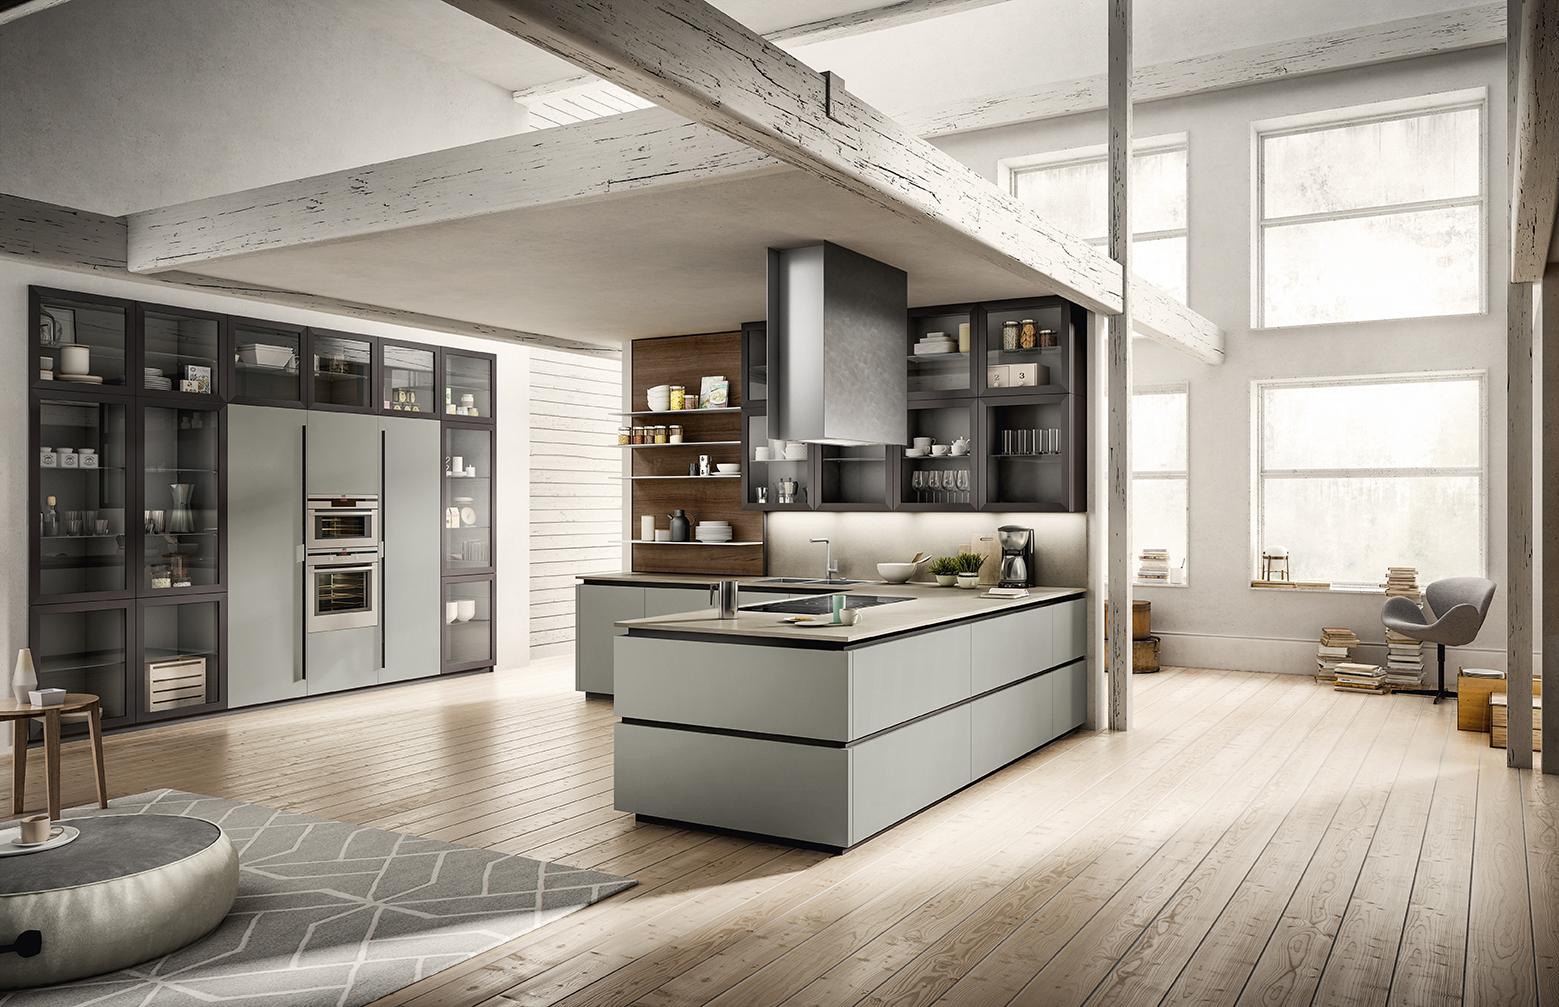 Zetasei di arredo cucine design arredare con stile